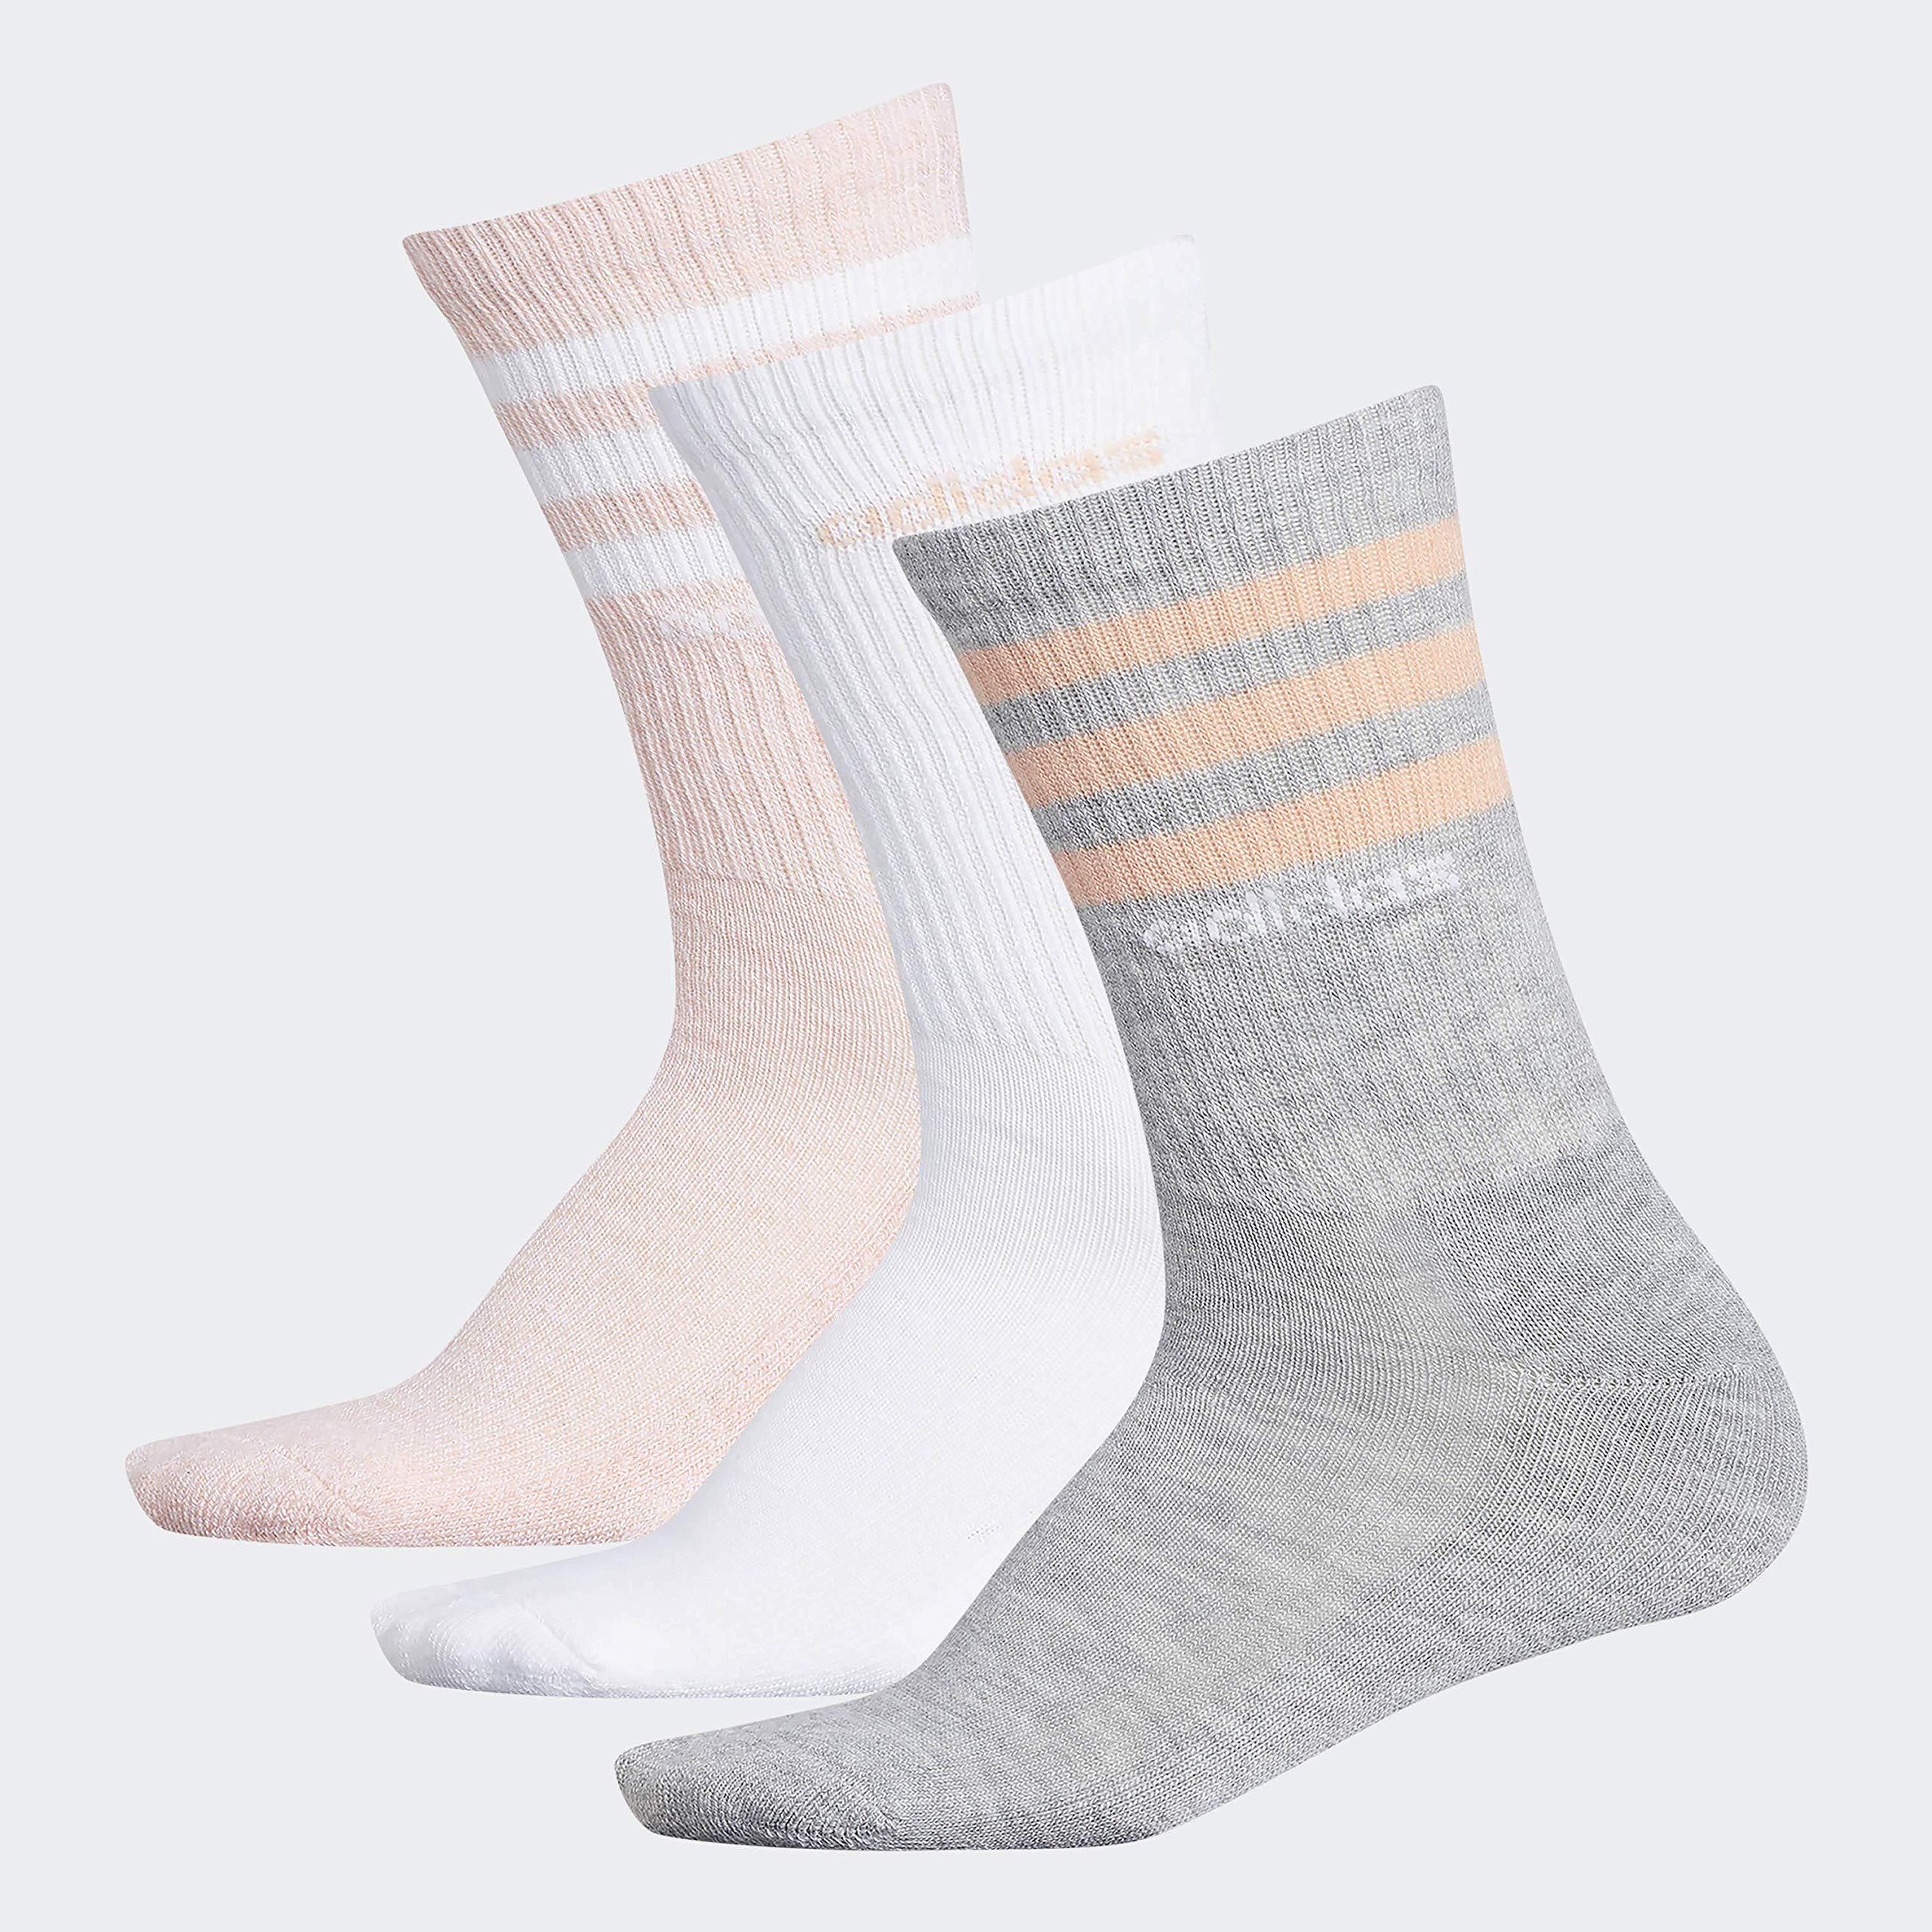 adidas Women's 3-Stripe Crew Socks (3-Pair), Light Heather Grey/Glow Pink/White/Glow Pink - White, Medium, (Shoe Size 5-10) by adidas